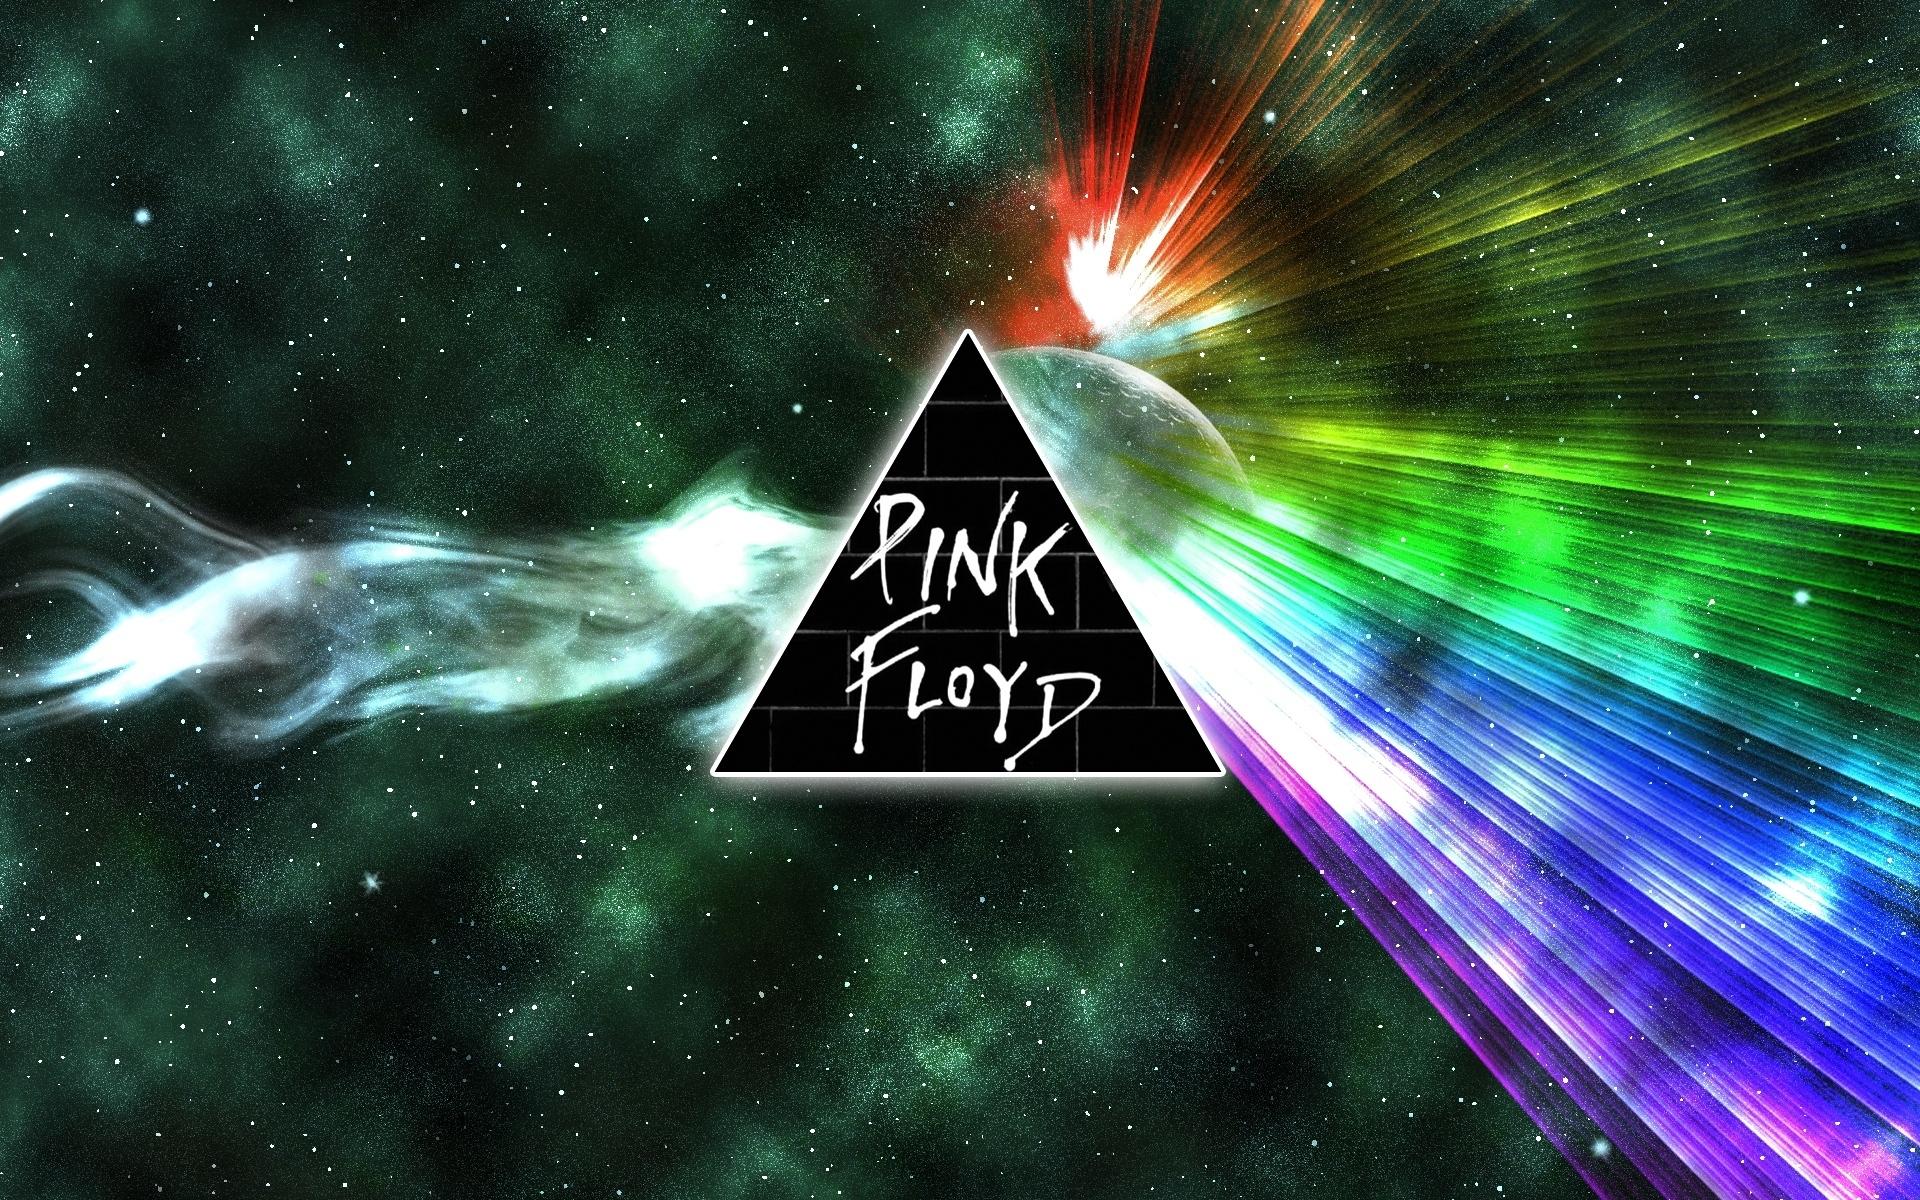 Pink Floyd   Pink Floyd Wallpaper 10566727 1920x1200